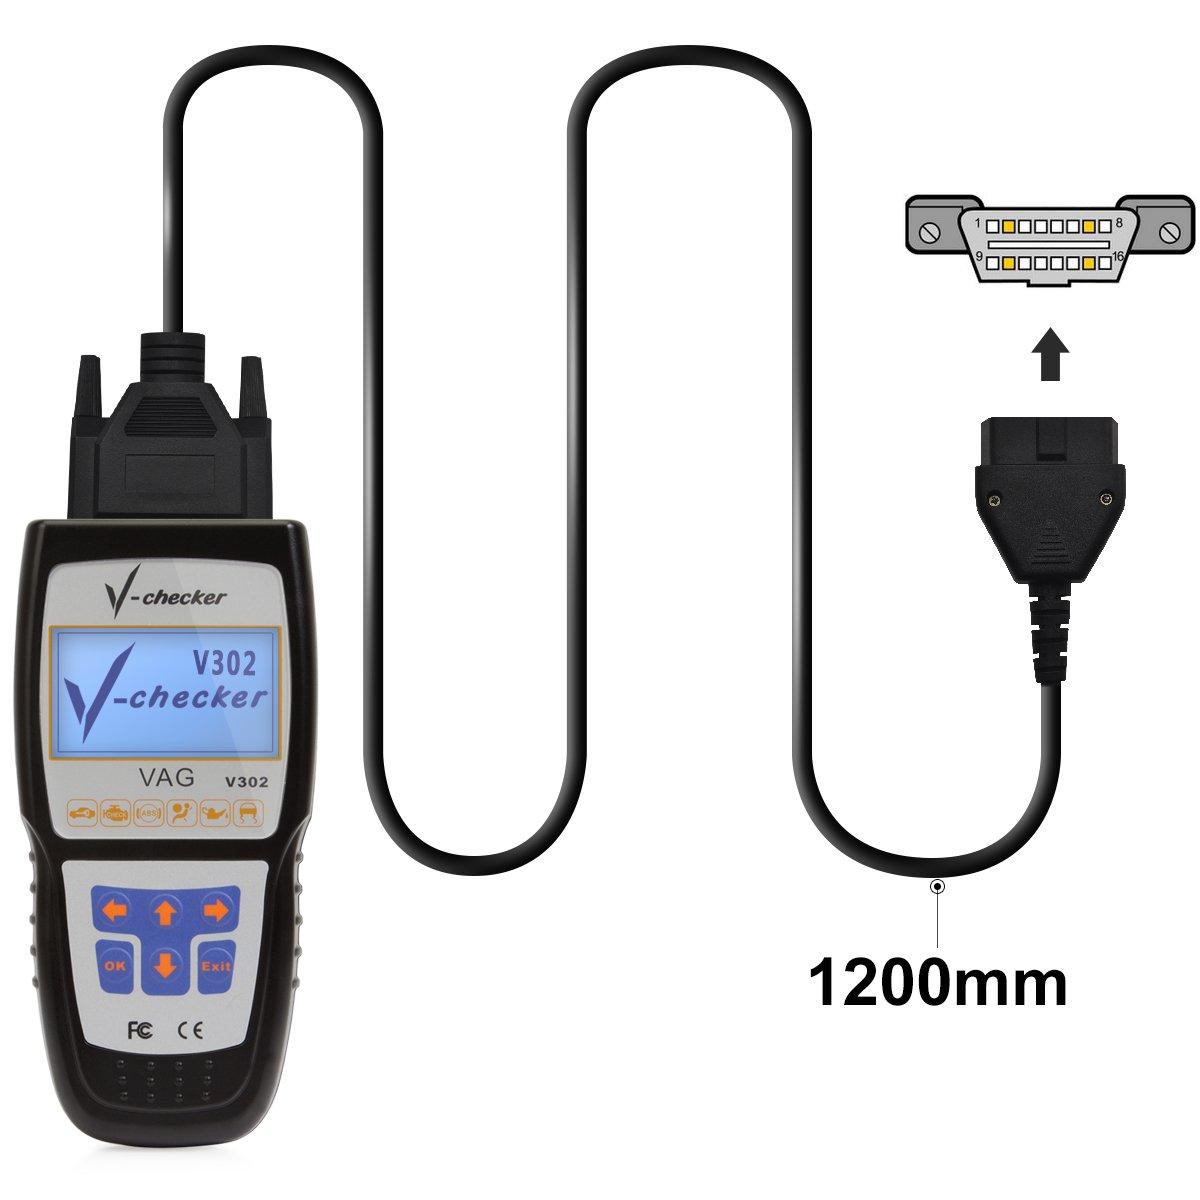 VAG Audi Volkwage Skoda Seat Scanner Vag Com Car Code Reader Fault Code Clear Diagnostic Scan Tool For VW Audi Skoda Seat by Autodiag (Image #4)